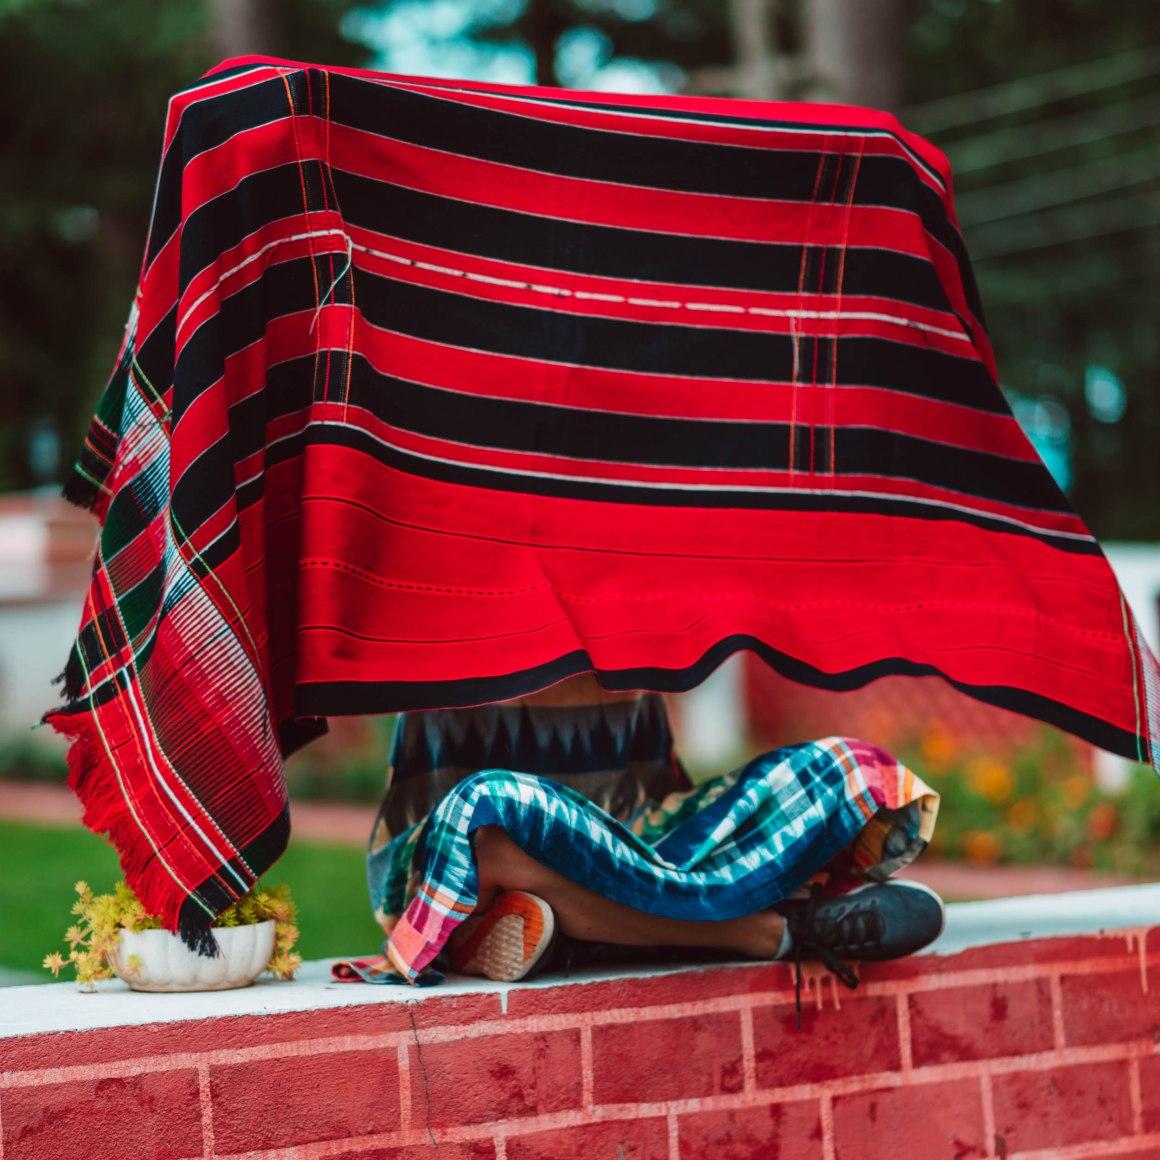 #EyesForDestinations, #EyesForIndia, #NAINAxRanikhet, Destination Photography, Landscape Photographer, Naina Redhu, Naina.co, Professional Photographer, Ranikhet, The Queen's Meadow, Uttarakhand, Family Vacation, Annual Vacation, Hills, Indian Hills, Hills in India, Photographer India, Blogger India, Travel Photographer, Travel Blogger, Photo Album